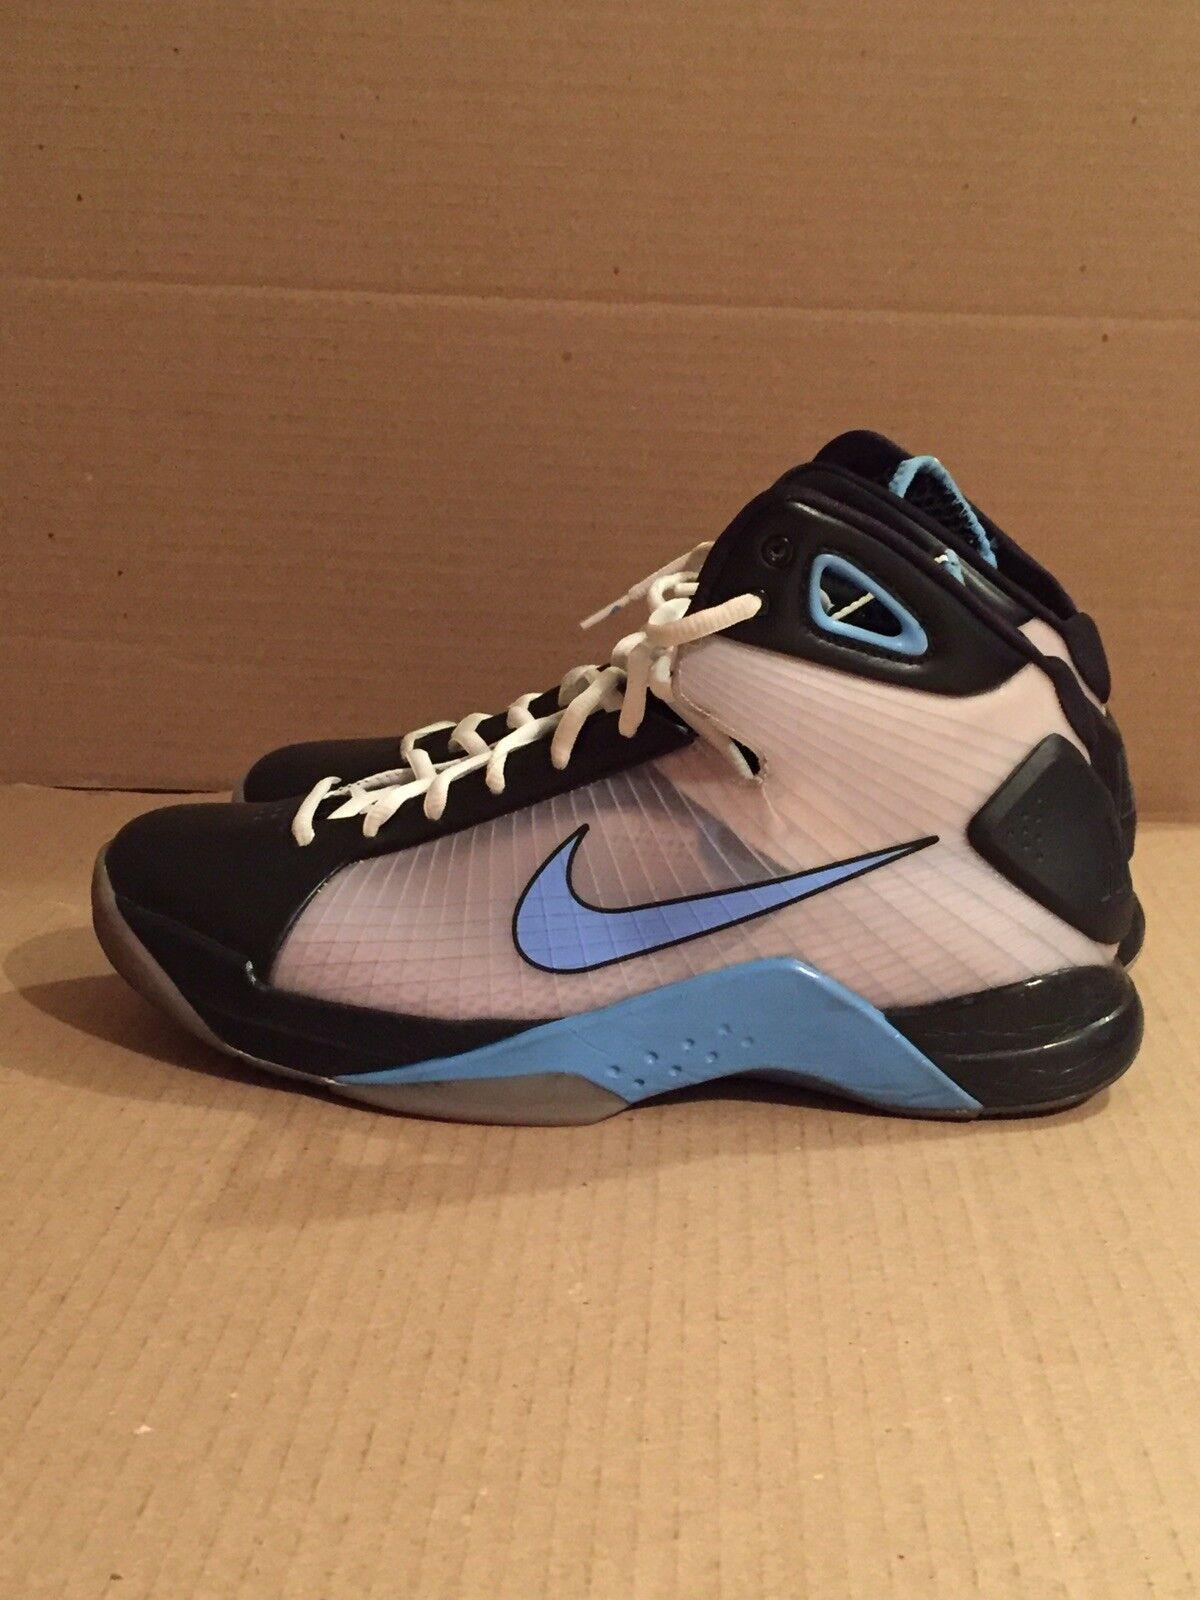 (2008) Nike Hyperdunk 324820-041 Size 11 Black University bluee White TAR Olympic